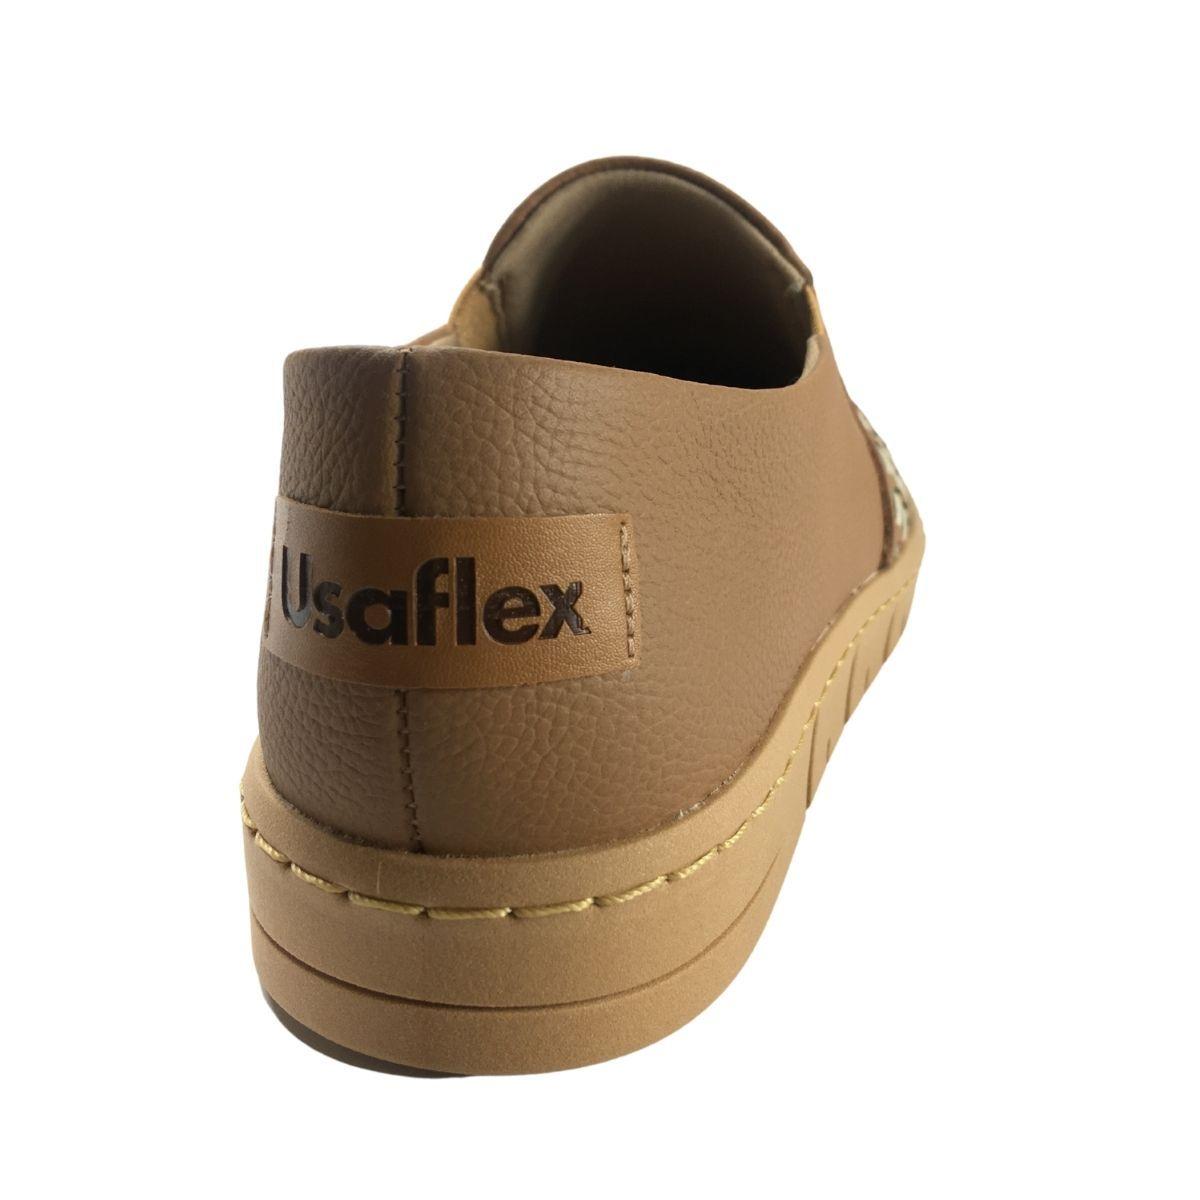 Tenis Meias Feminino Casual Usaflex Reflax Confort Slip On